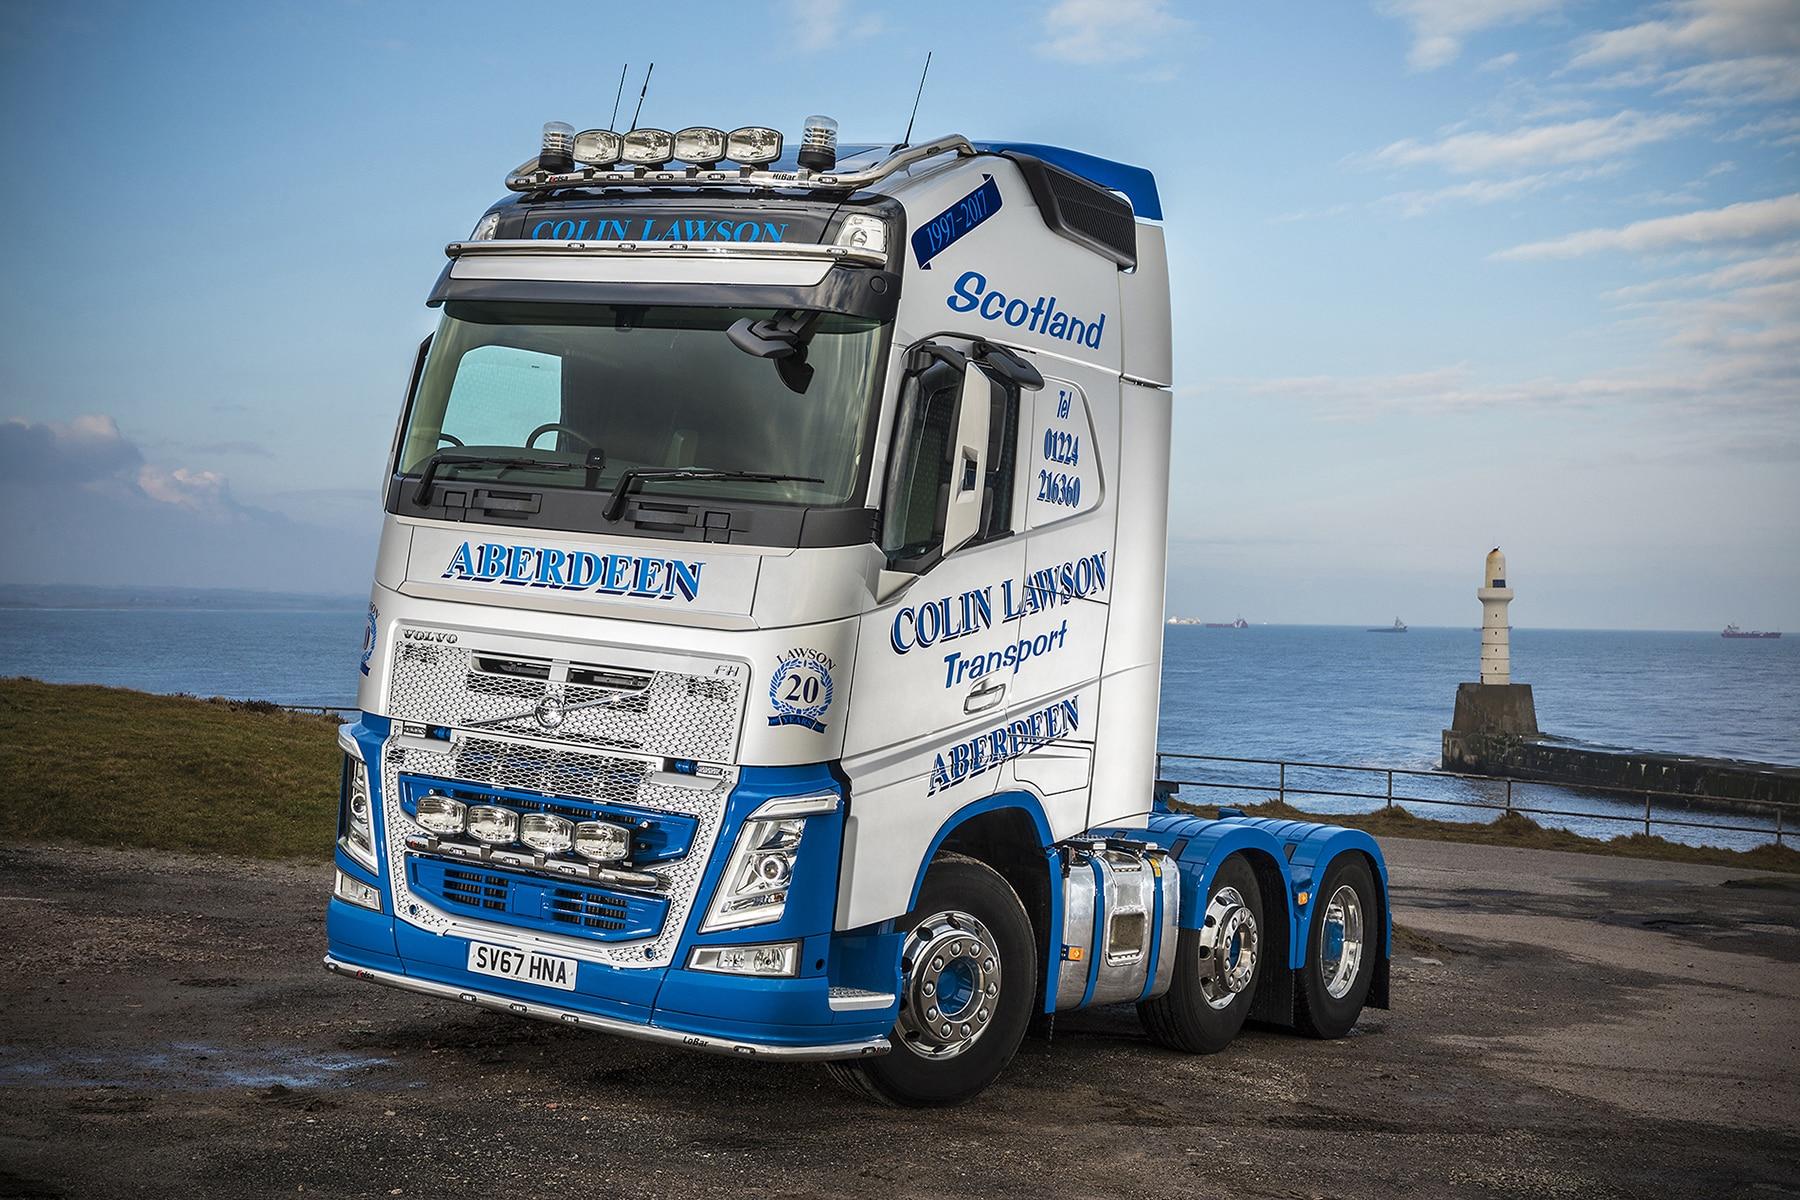 Volvo FH-5000 for Colin Lawson Transport